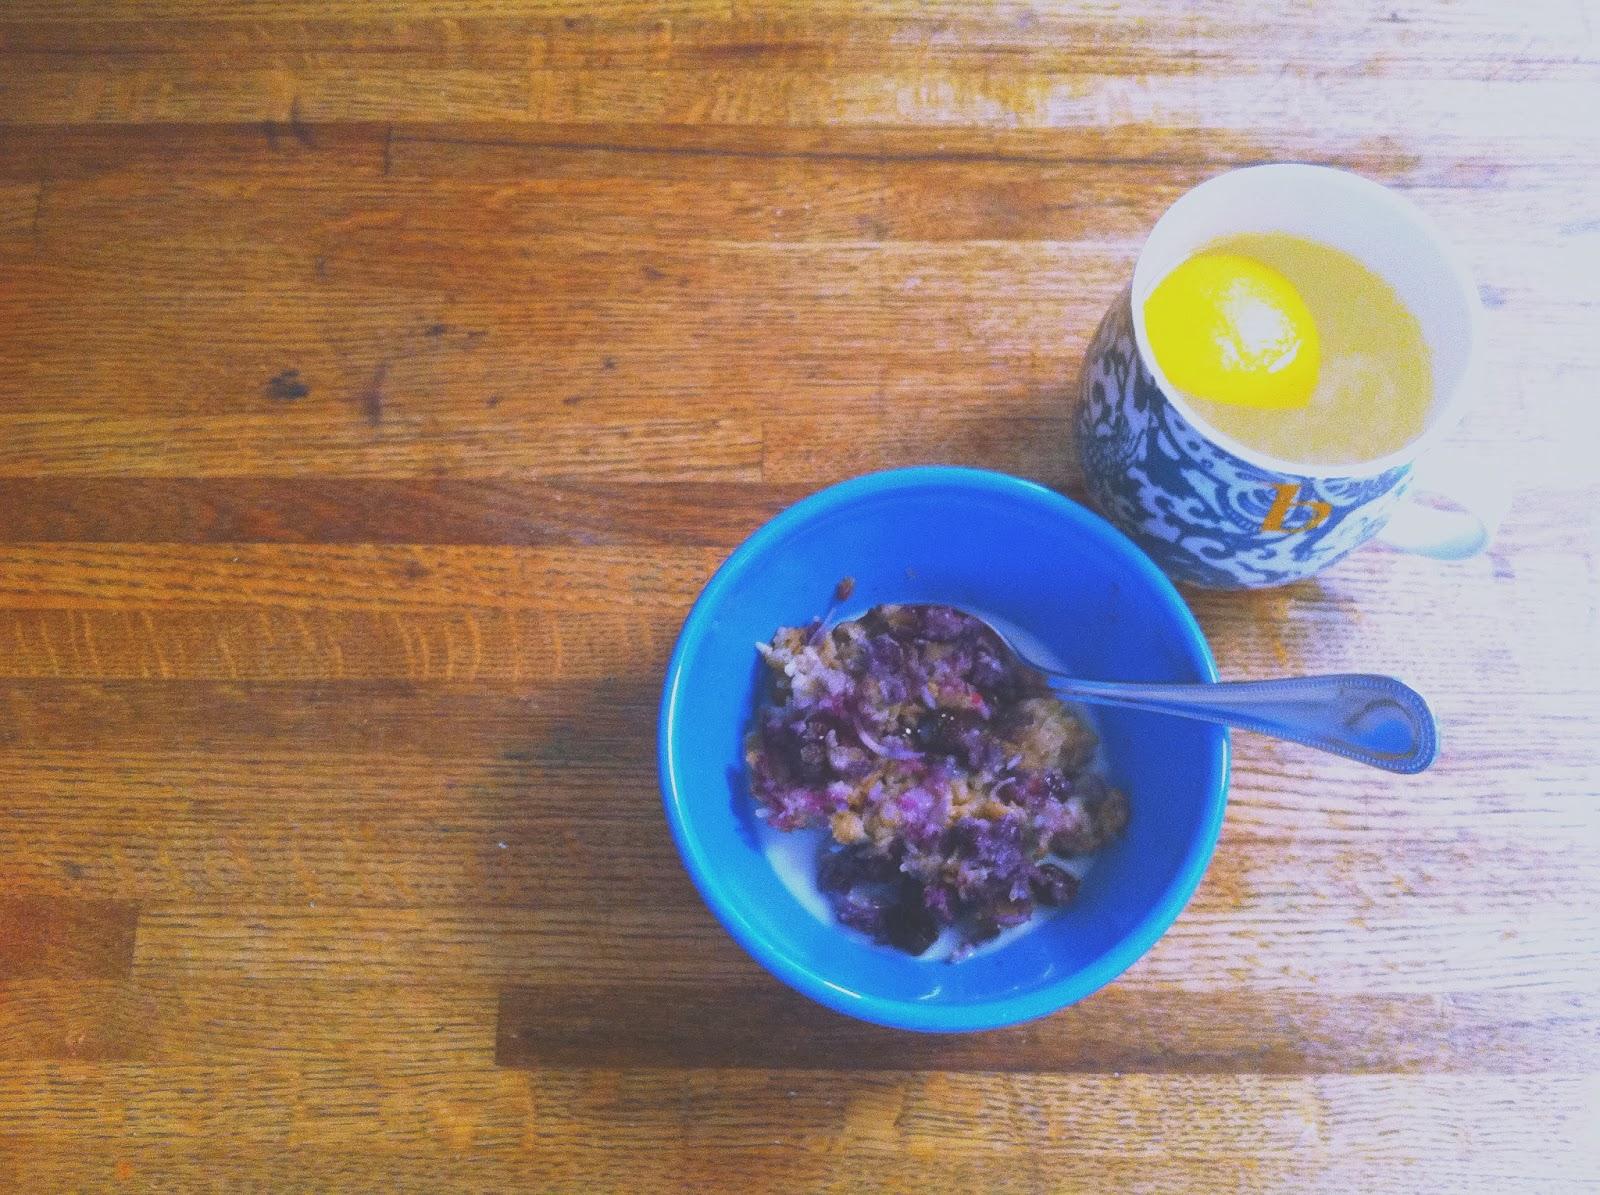 Bringing Up Burns: Baked Blueberry Coconut Oatmeal